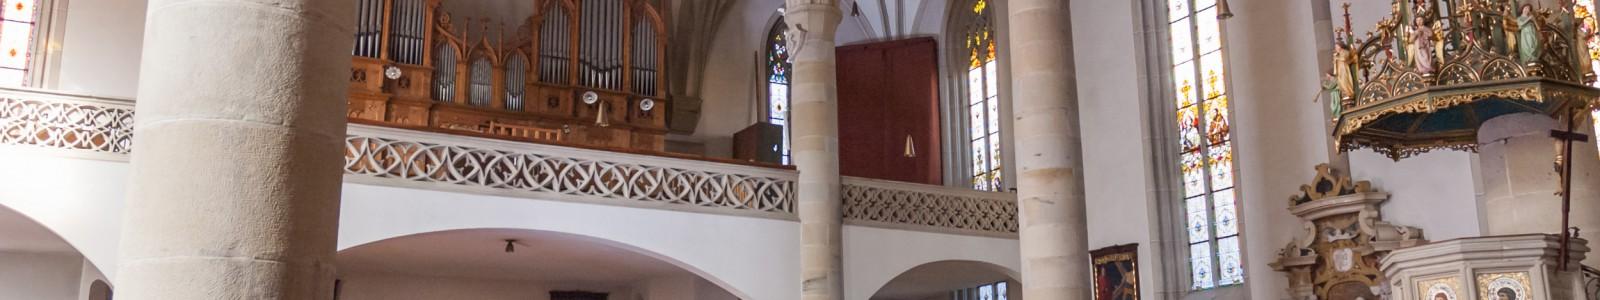 Innenaufnahme Pfarrkirche Tramin